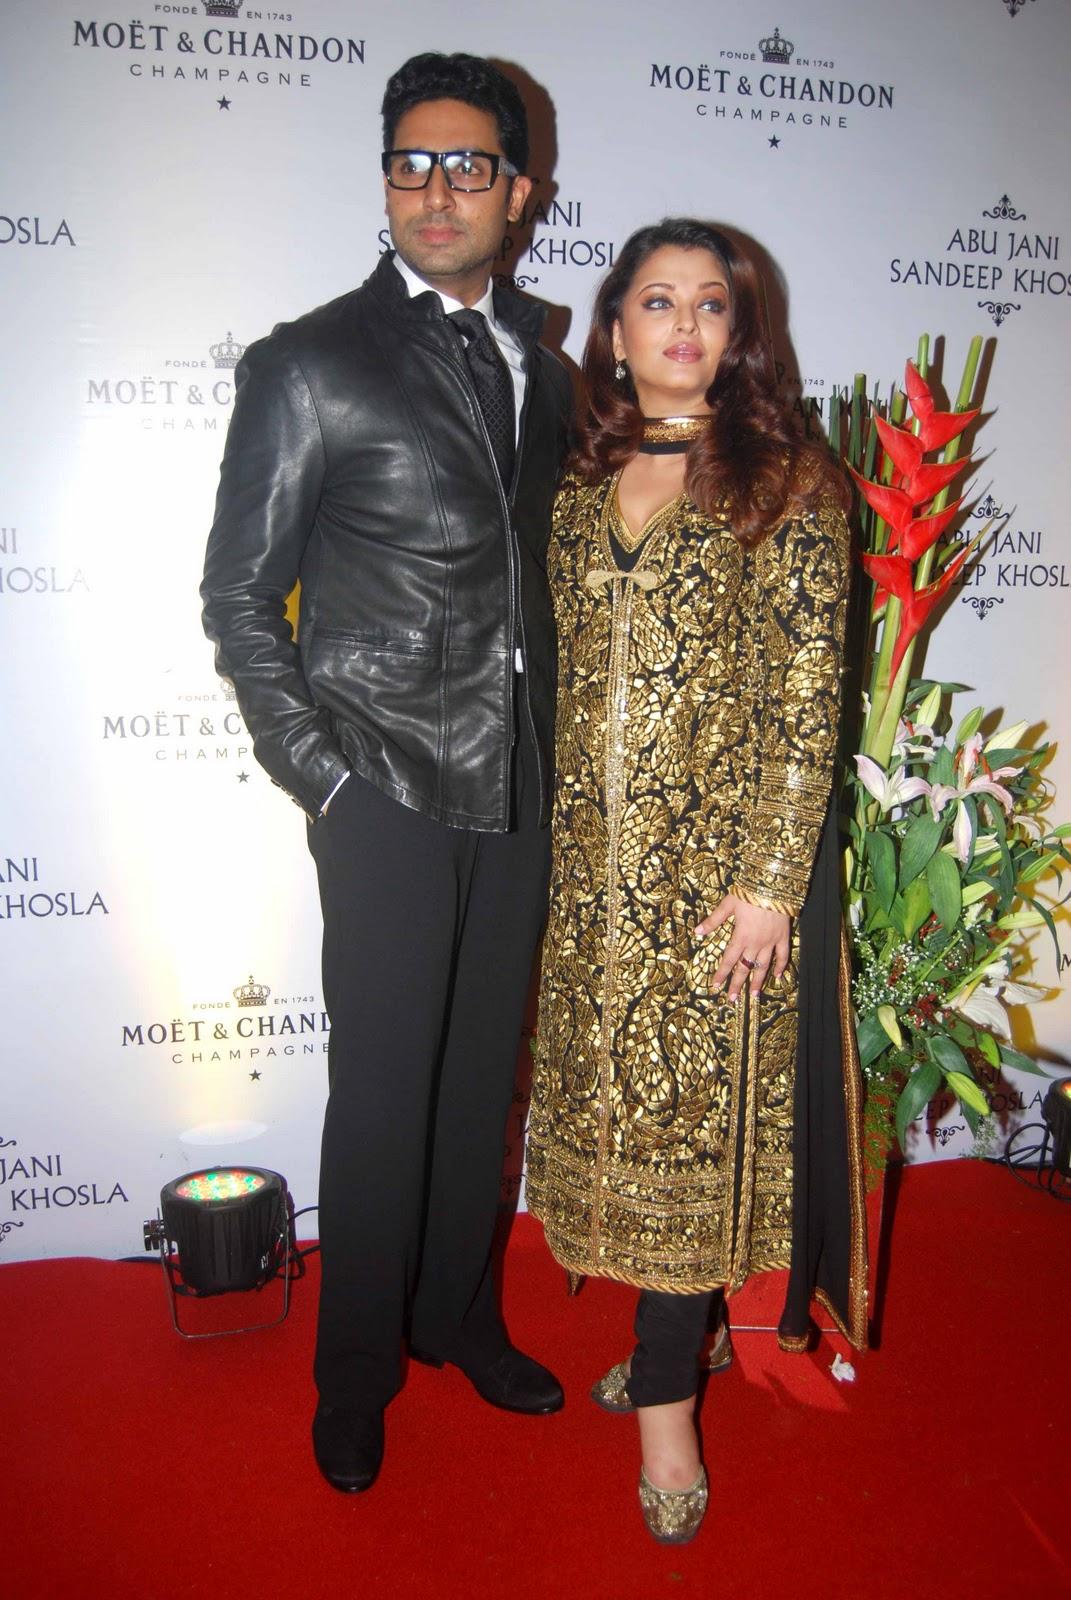 http://1.bp.blogspot.com/--MHsOio1-sY/TrtdkqjbN-I/AAAAAAAAFYM/58HWTvVJpsQ/s1600/Abhishek-and-Aishwarya-Rai-Bachchan-at-Abu-Jani-Sandeep-Khosla-25th-Anniversary-Celebration-28.JPG